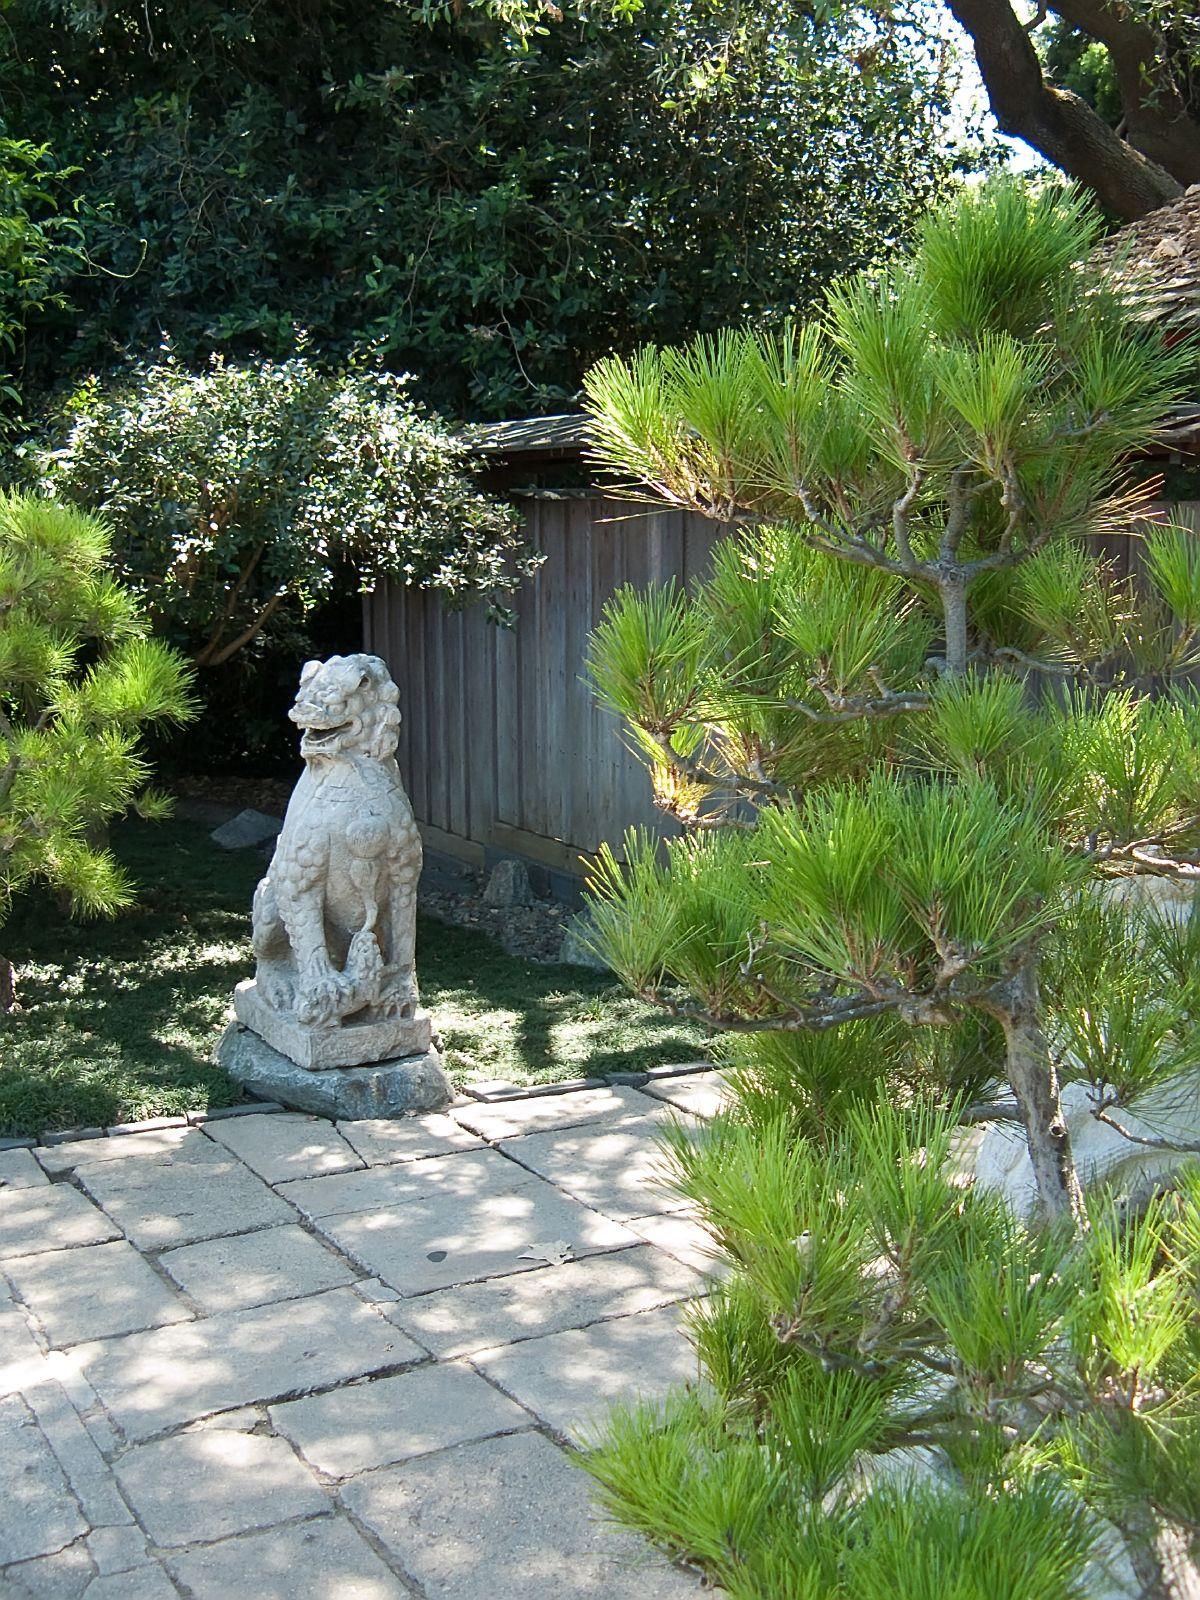 Guardian Lion In Japanese Gardens At Huntington Gardens Pasadena California Flickr Photo